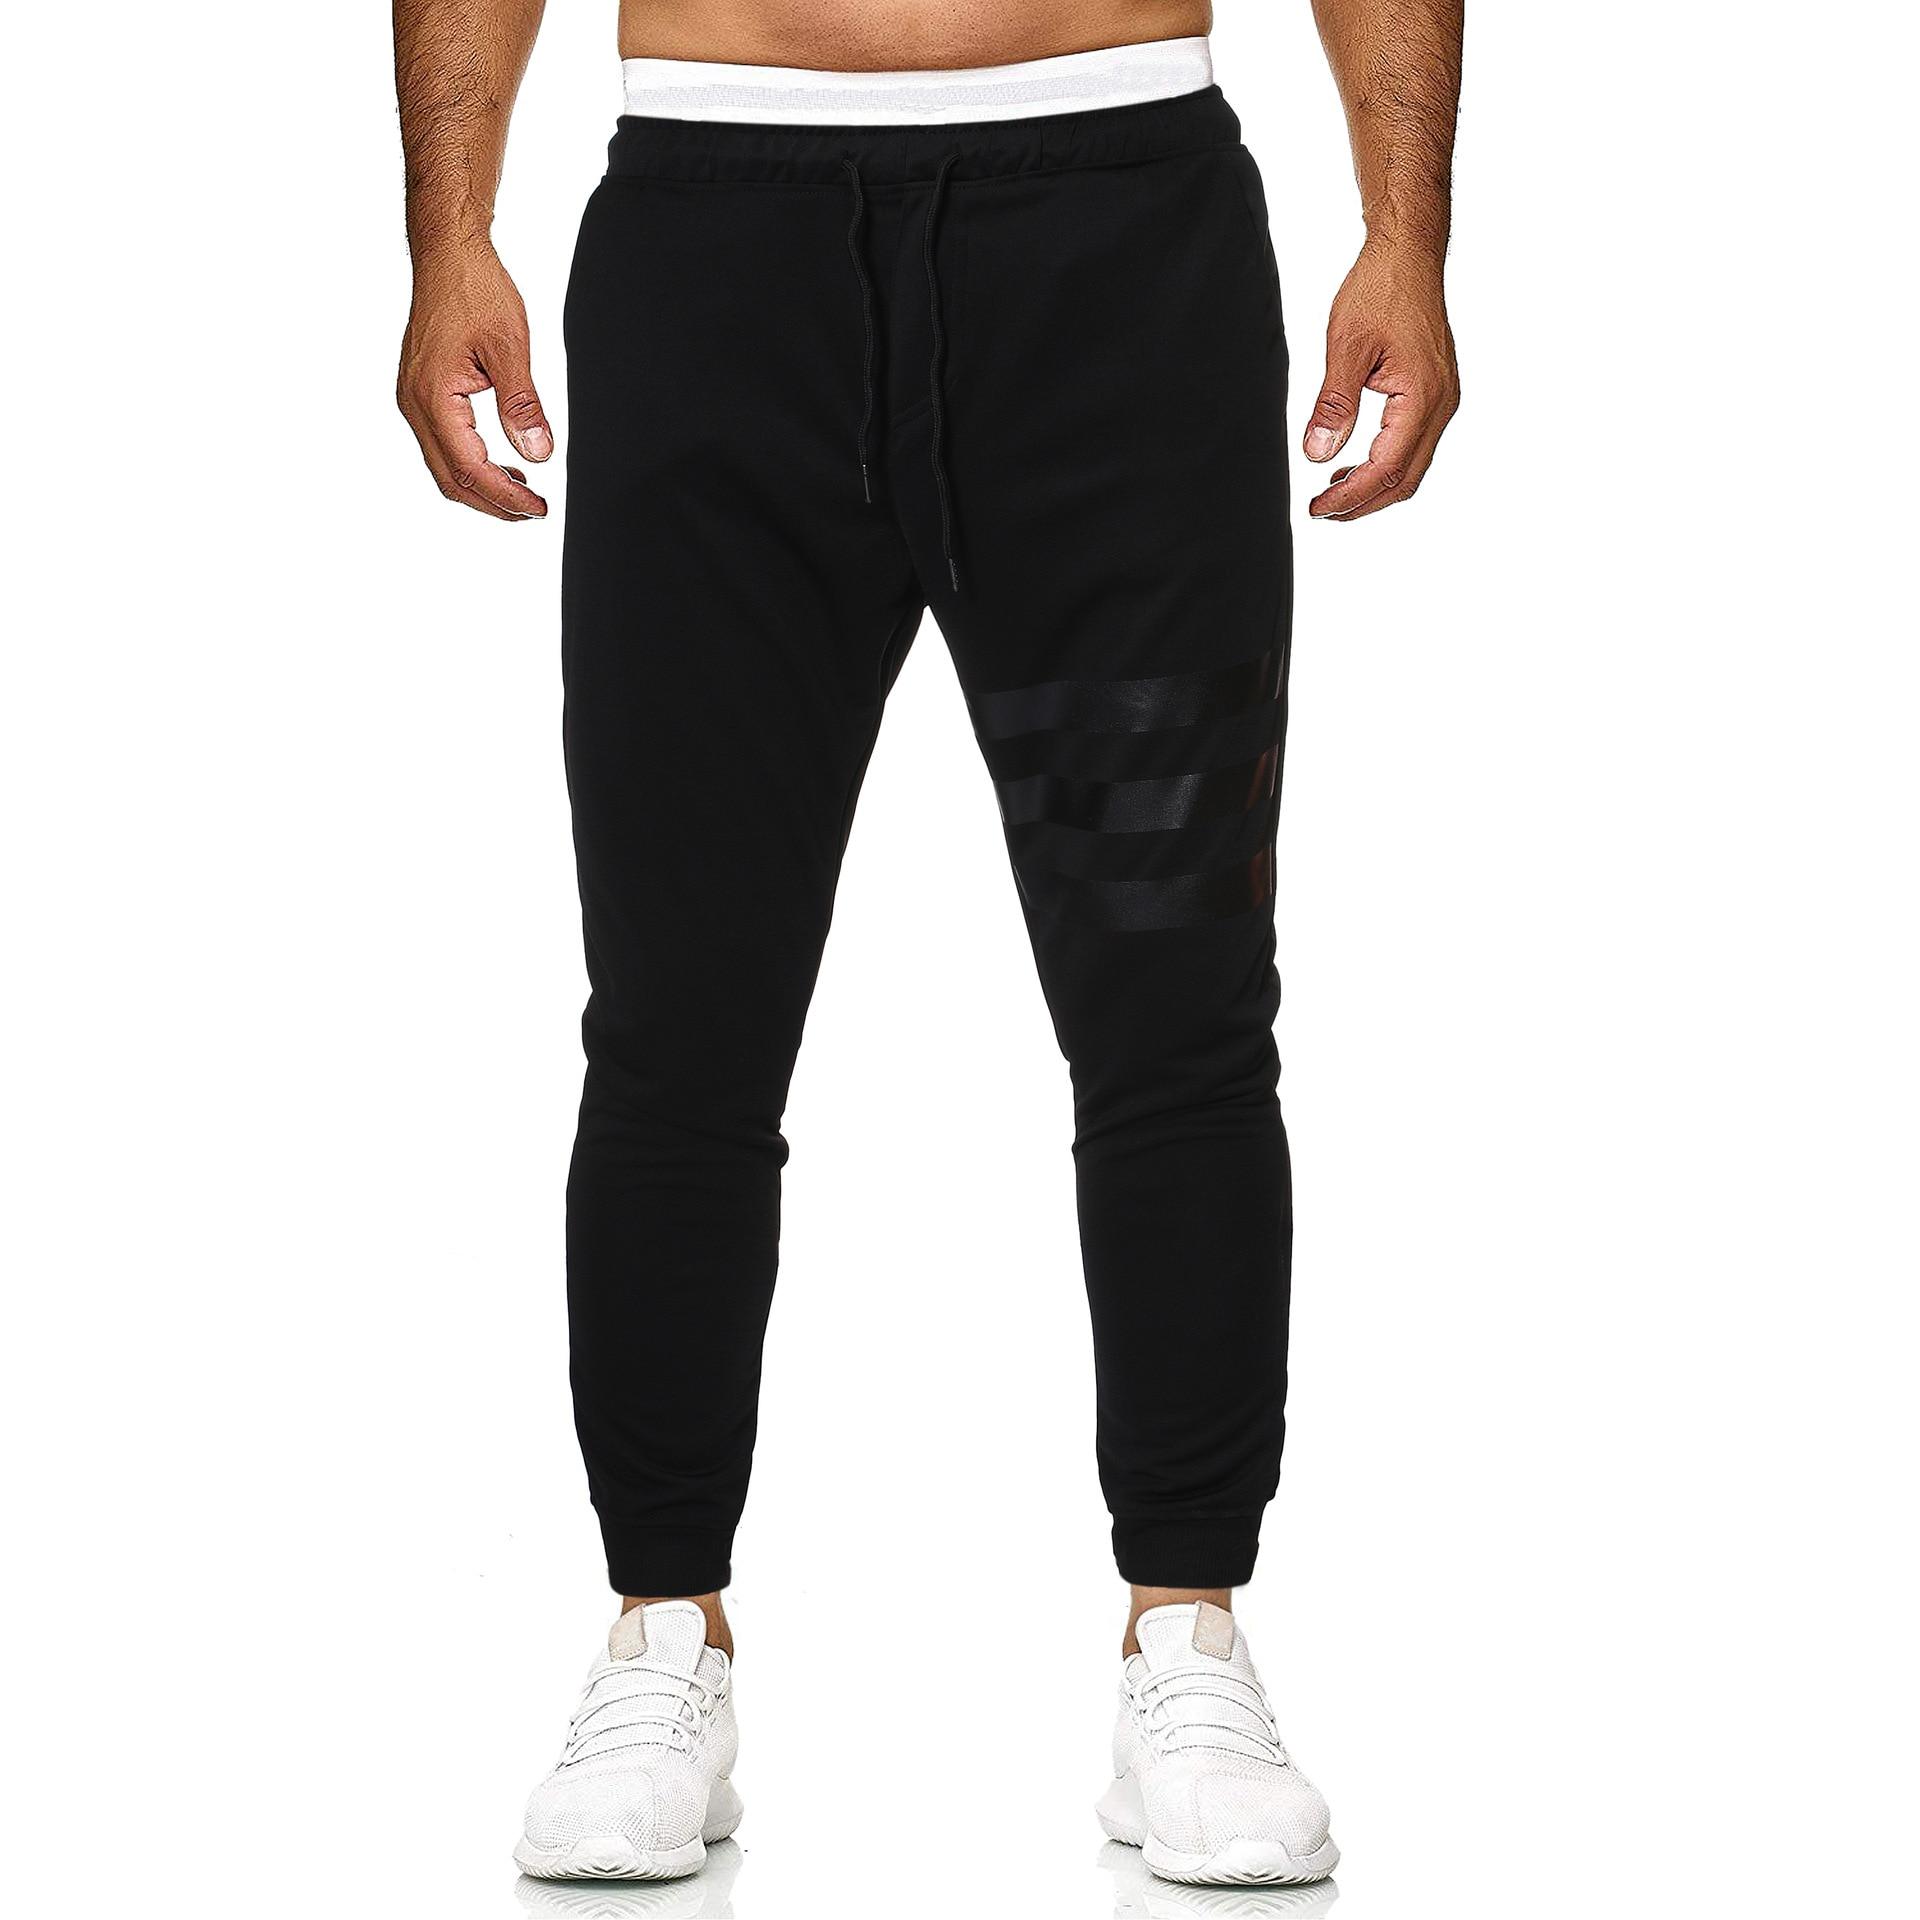 Trousers Men's 2019 Summer New Style Fashion Men Casual Trousers Black Three Lever Beam Leg K102